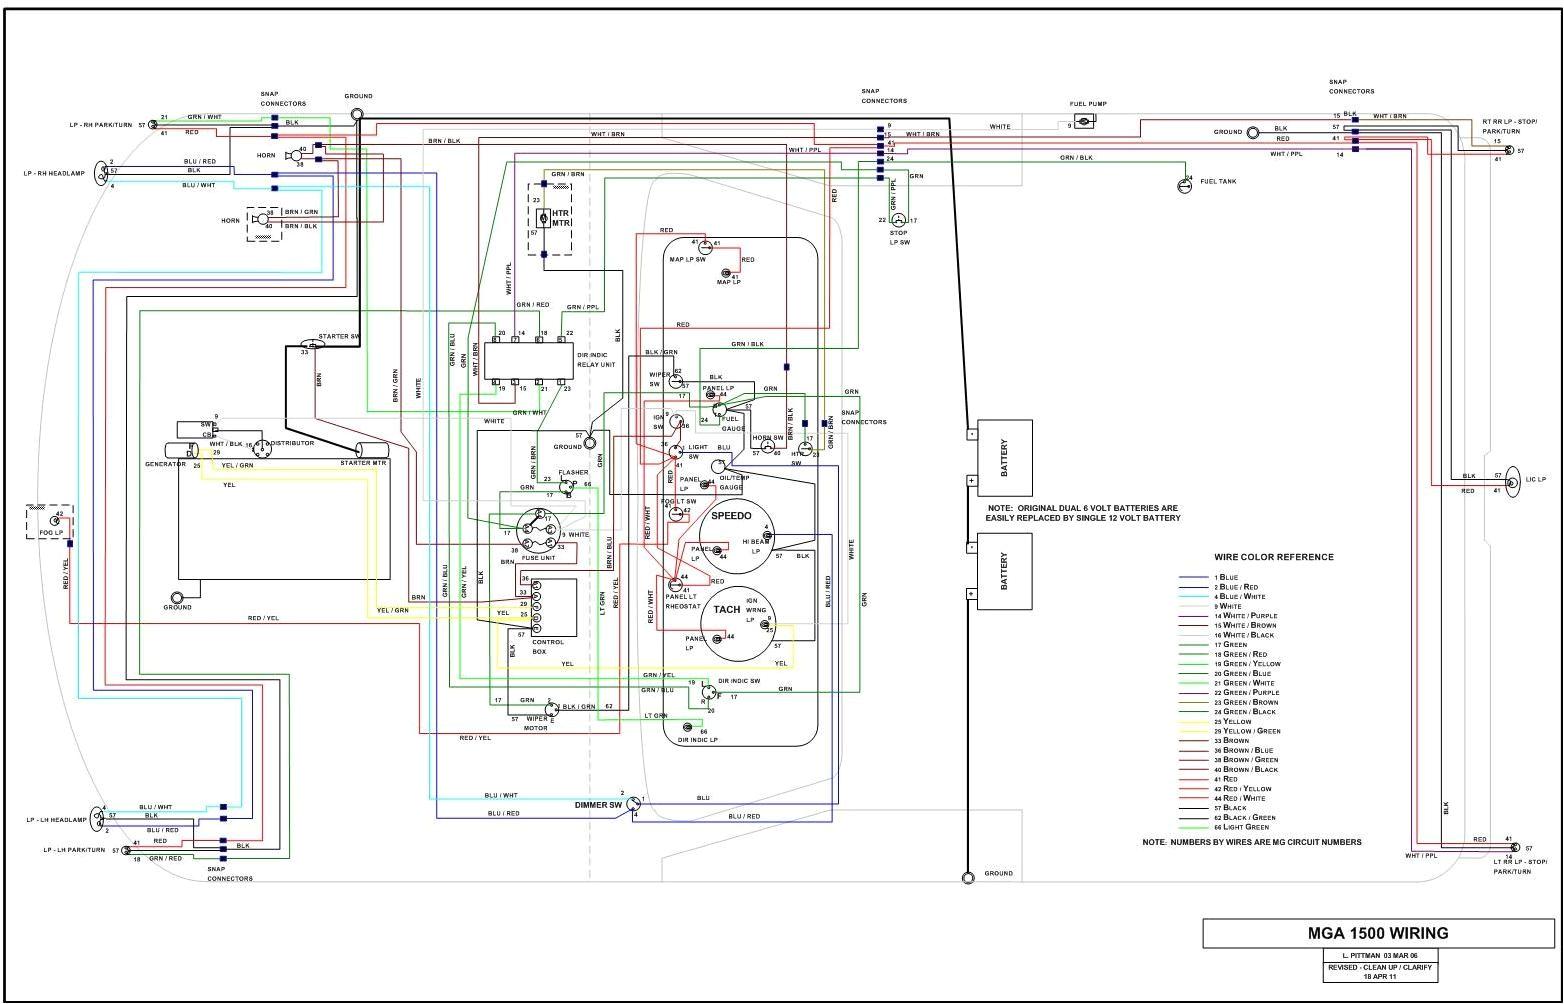 1957 mg wiring diagram wiring diagram expert 1957 mg wiring diagram